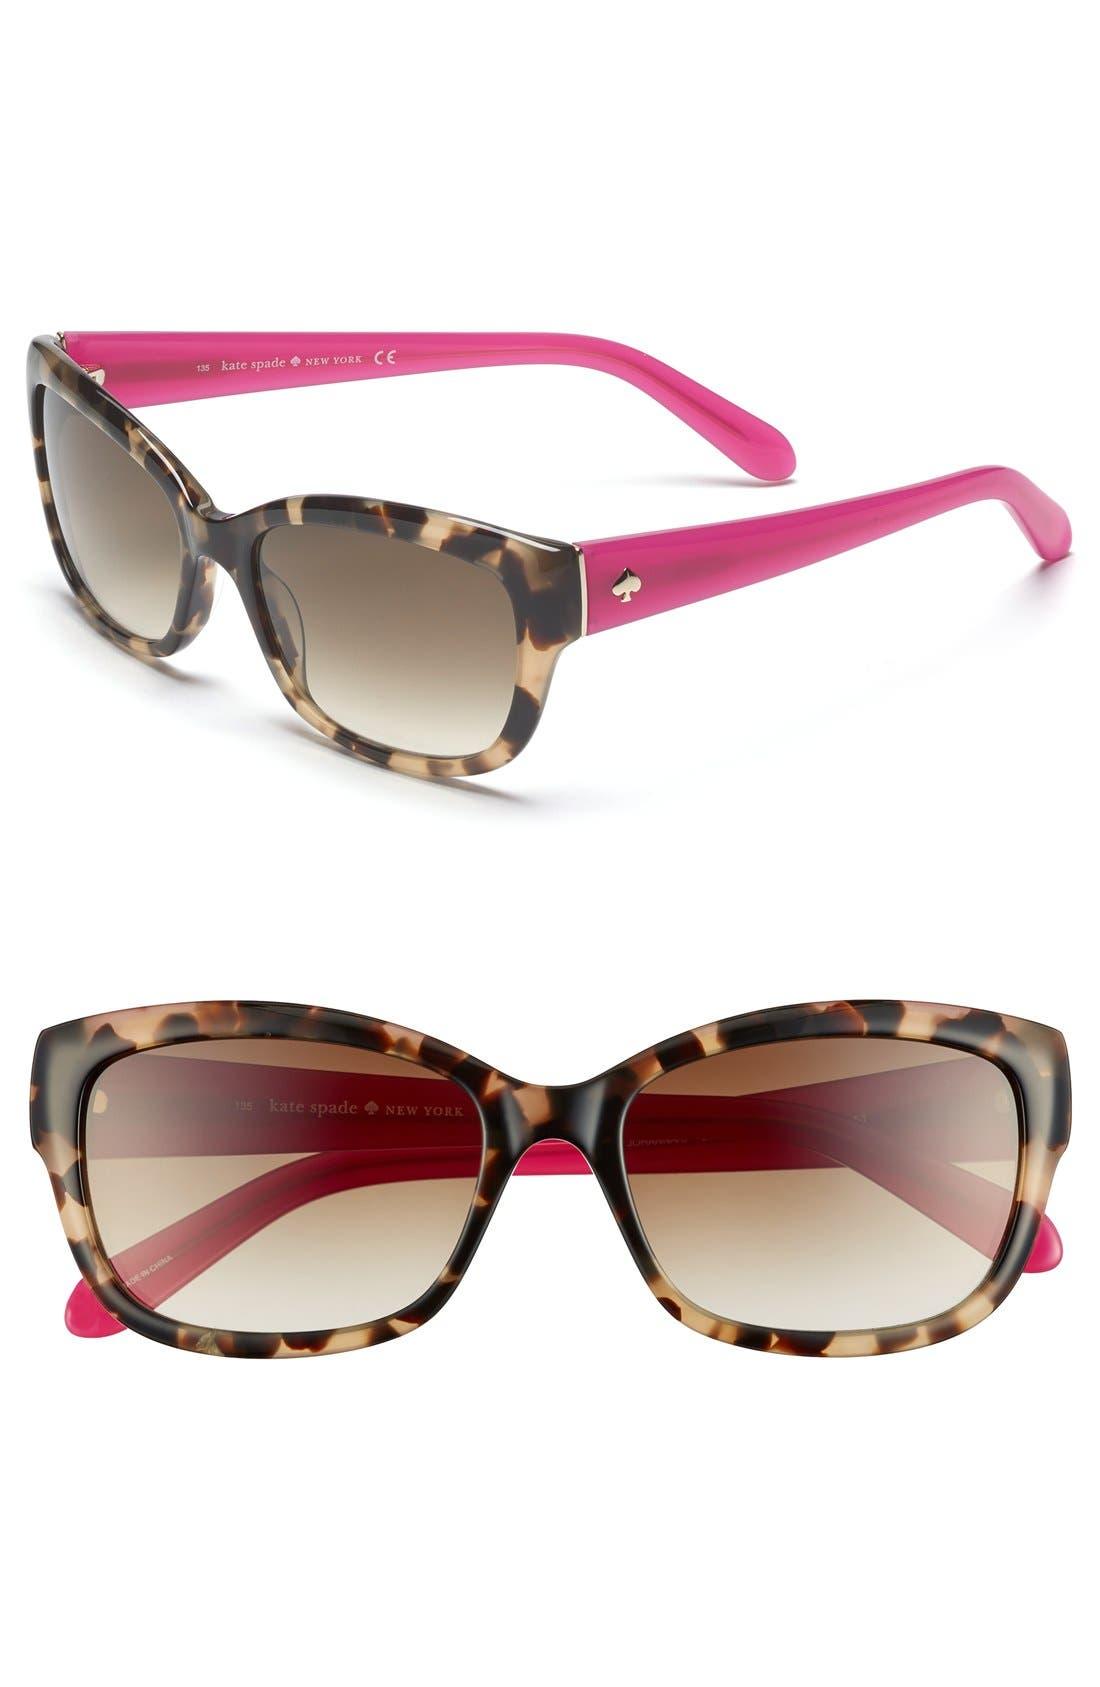 Alternate Image 1 Selected - kate spade 'johanna' 53mm retro sunglasses